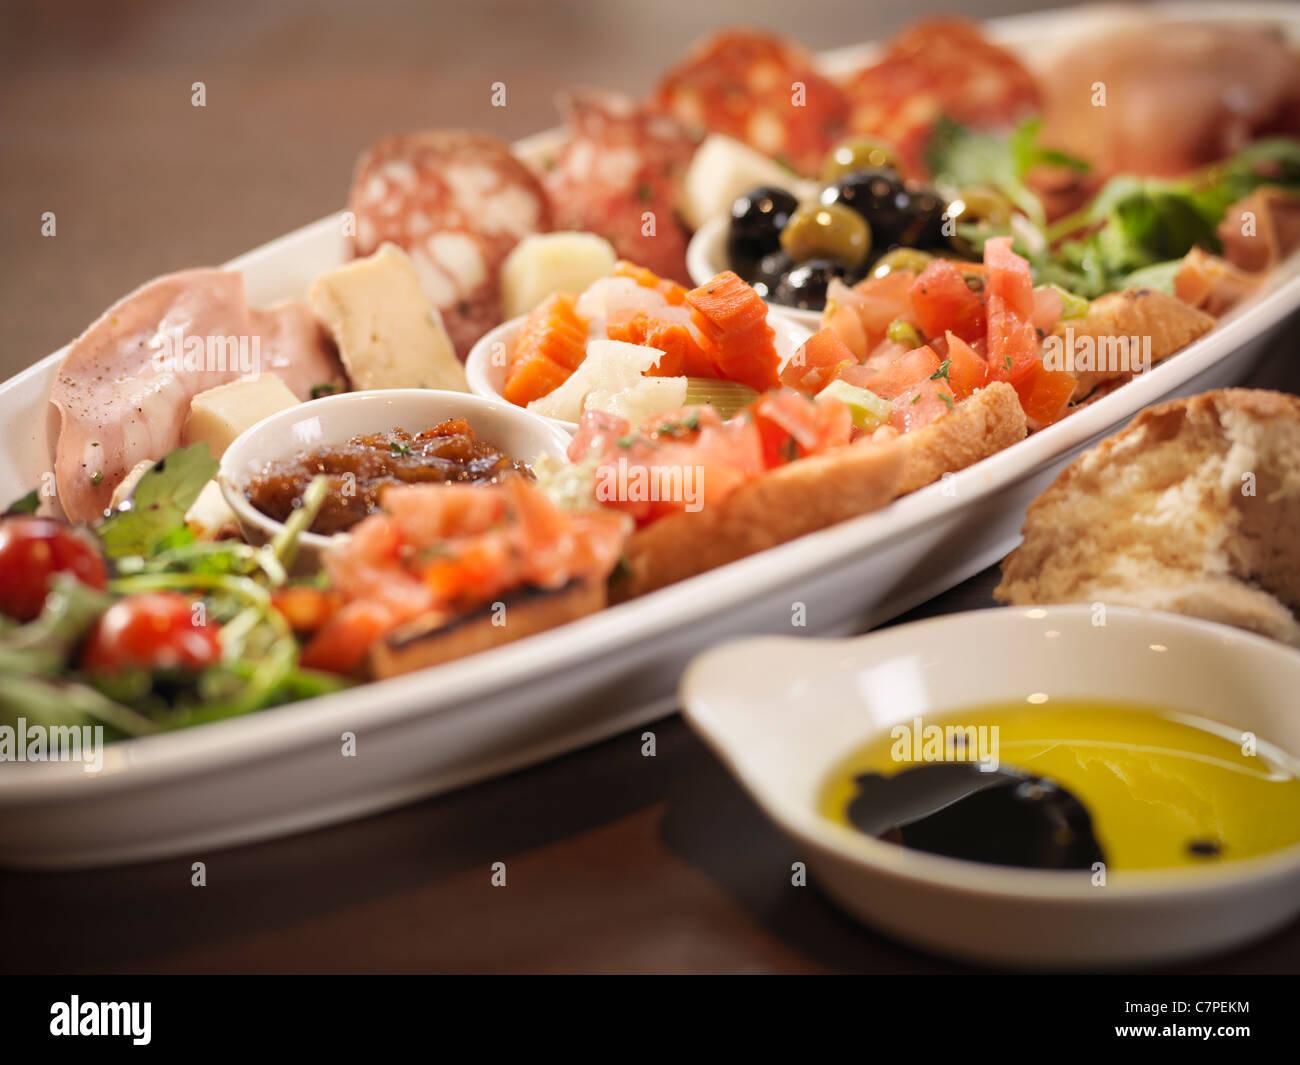 Plate of antipasto in restaurant - Stock Image